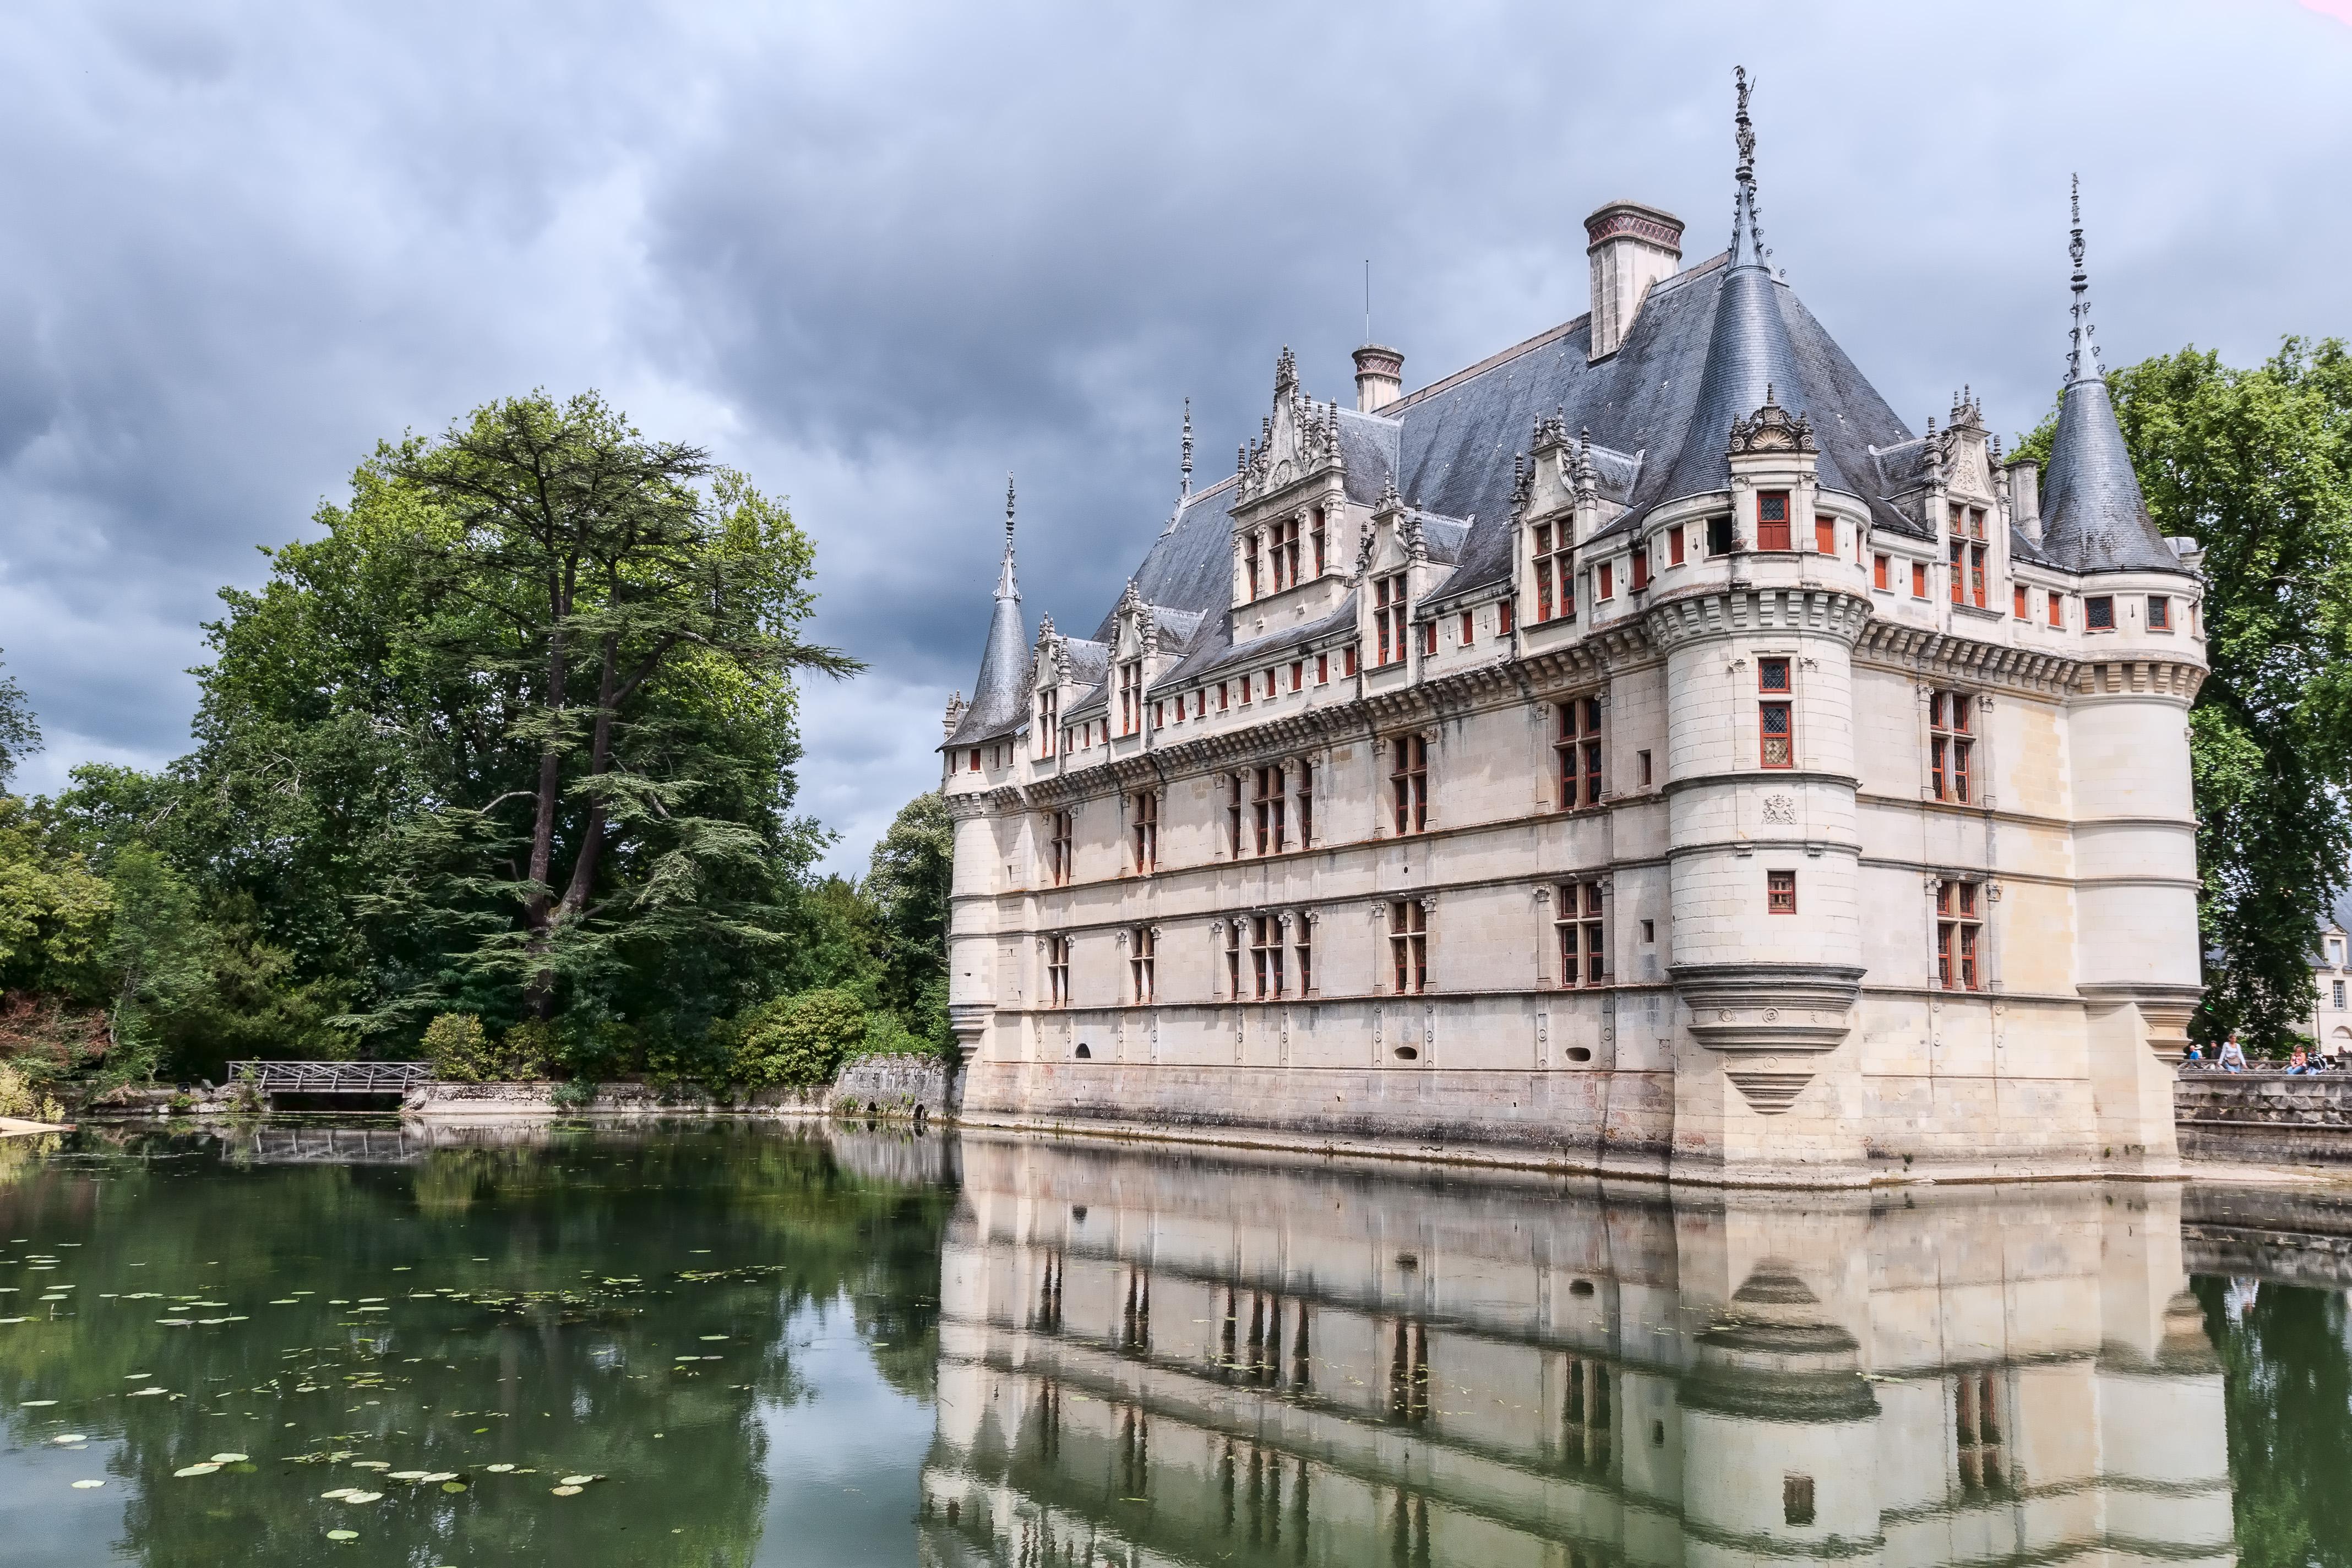 59-chateau-azay-le-rideau-1.jpg